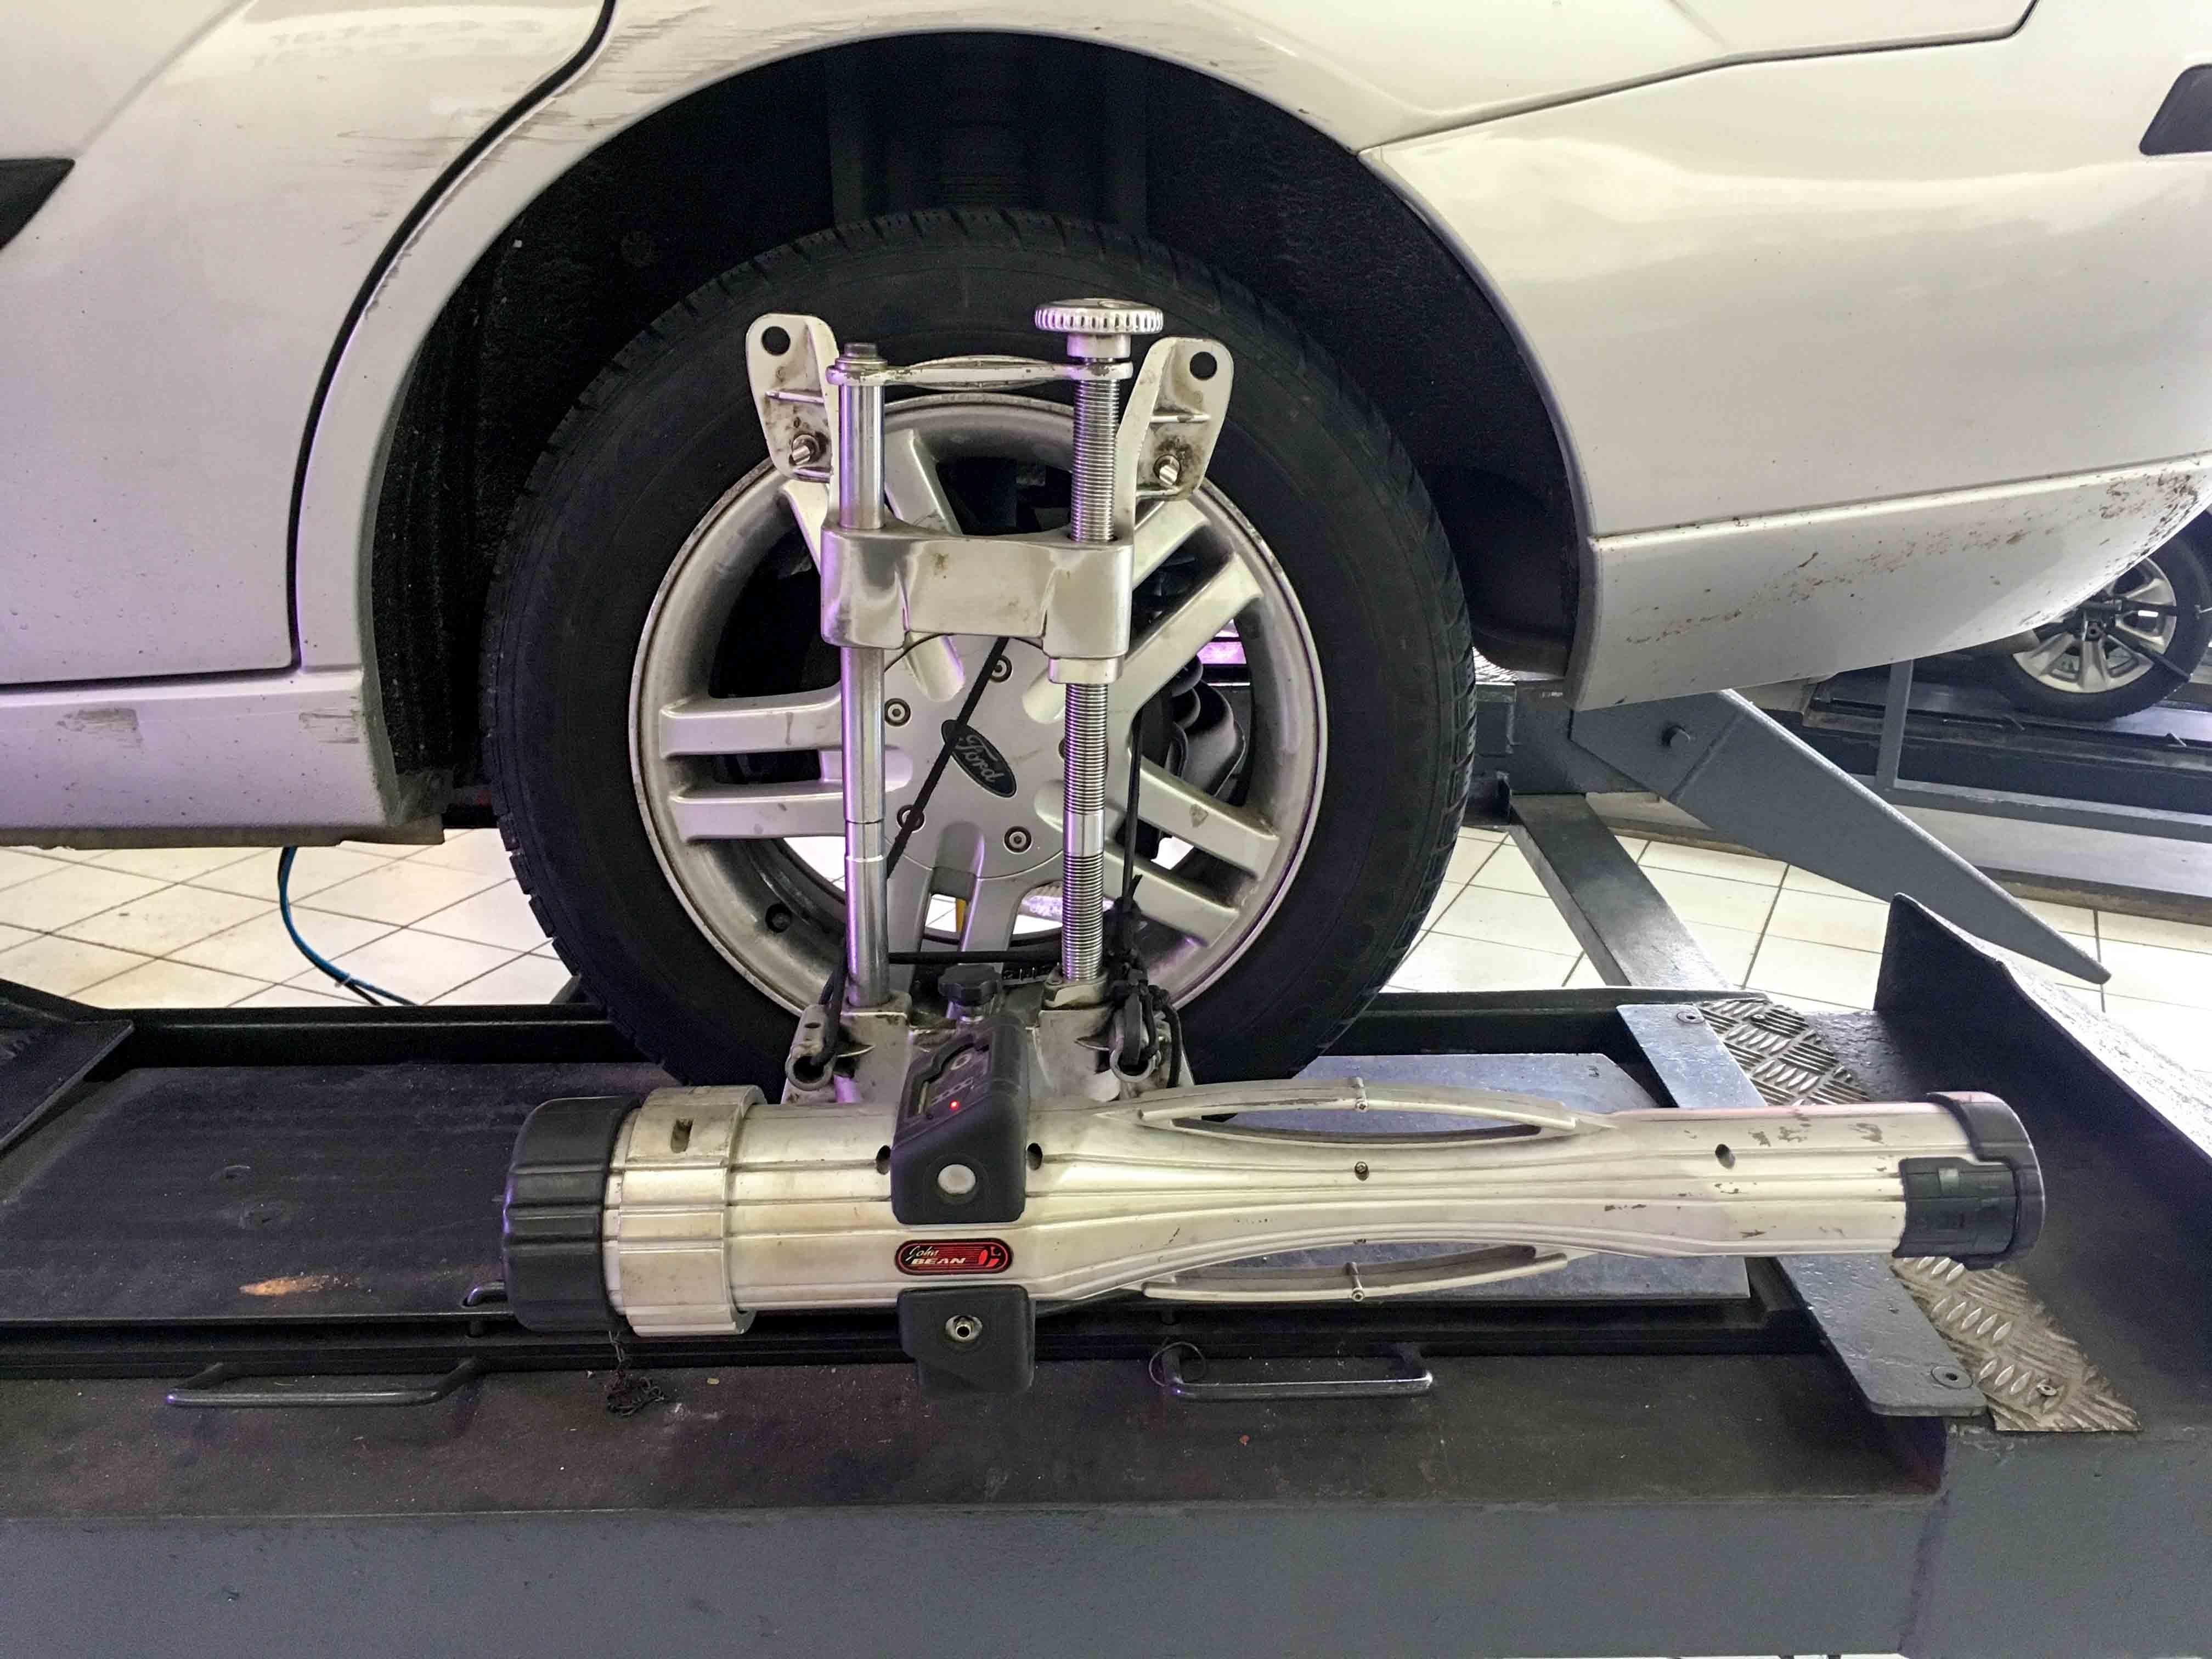 Mazda 3 Service Manual: Fuel Filter (High Pressure) RemovalInstallation Mzr 2.0, Mzr 2.5